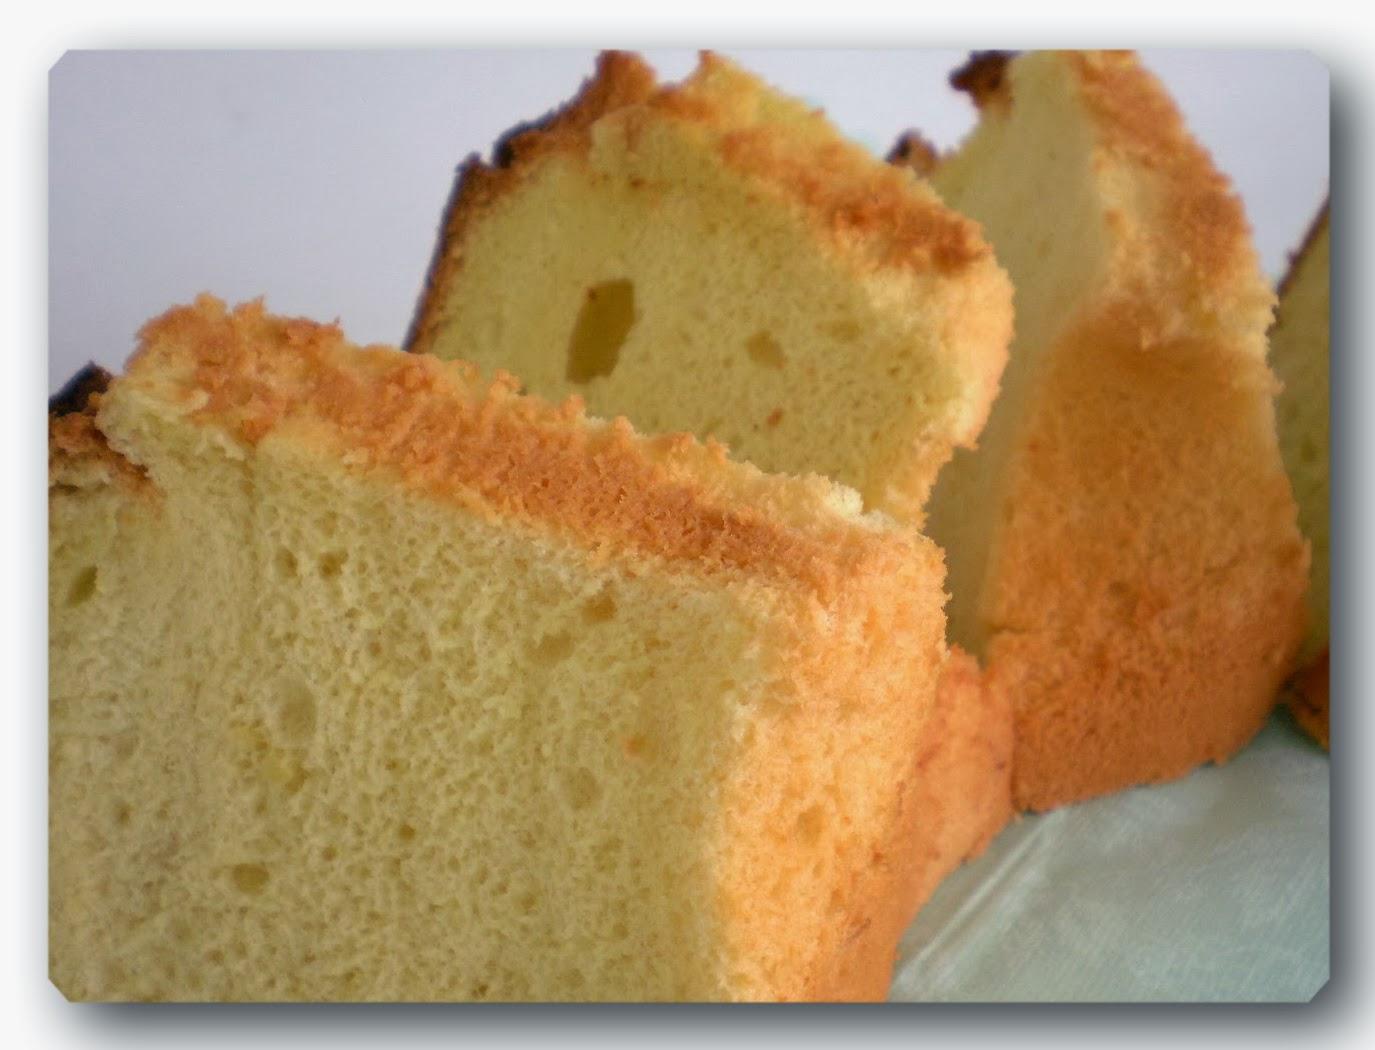 resep cake durian